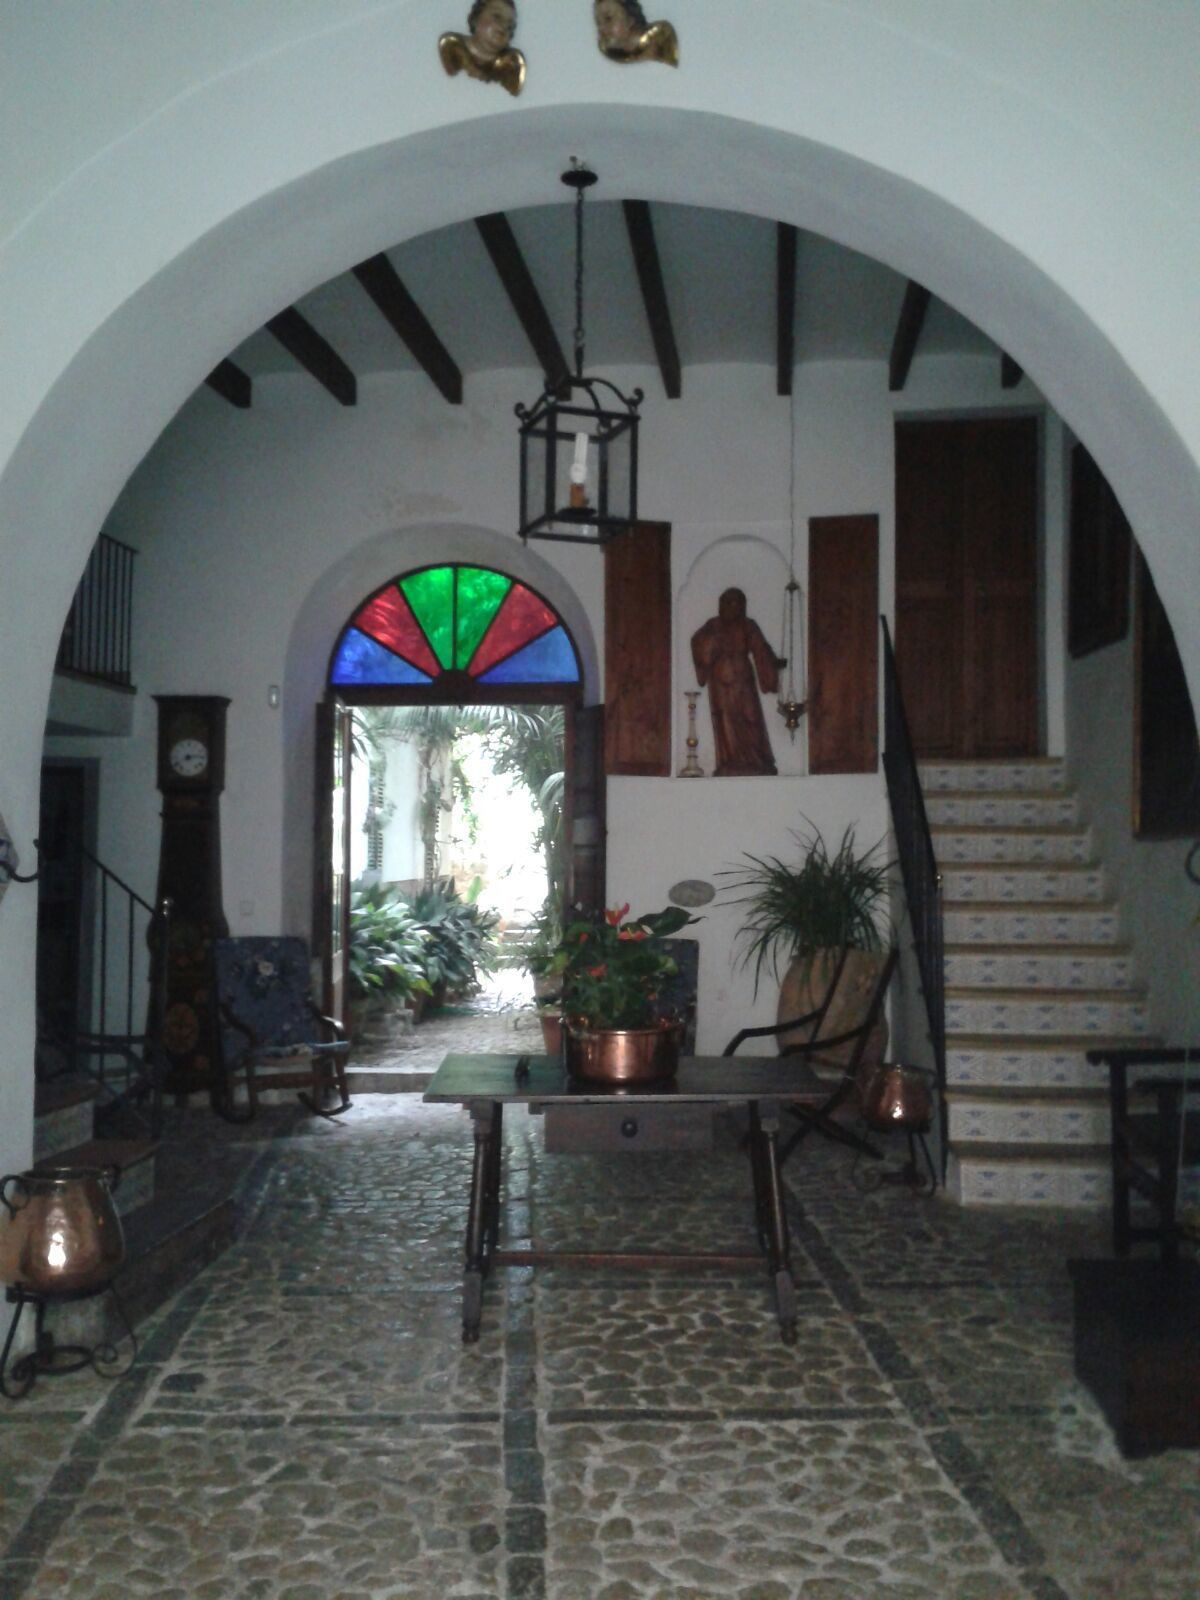 Casa de estilo tradicional mallorquina, con encanto, situada en una calle muy centrica en Soller, mu,Spain